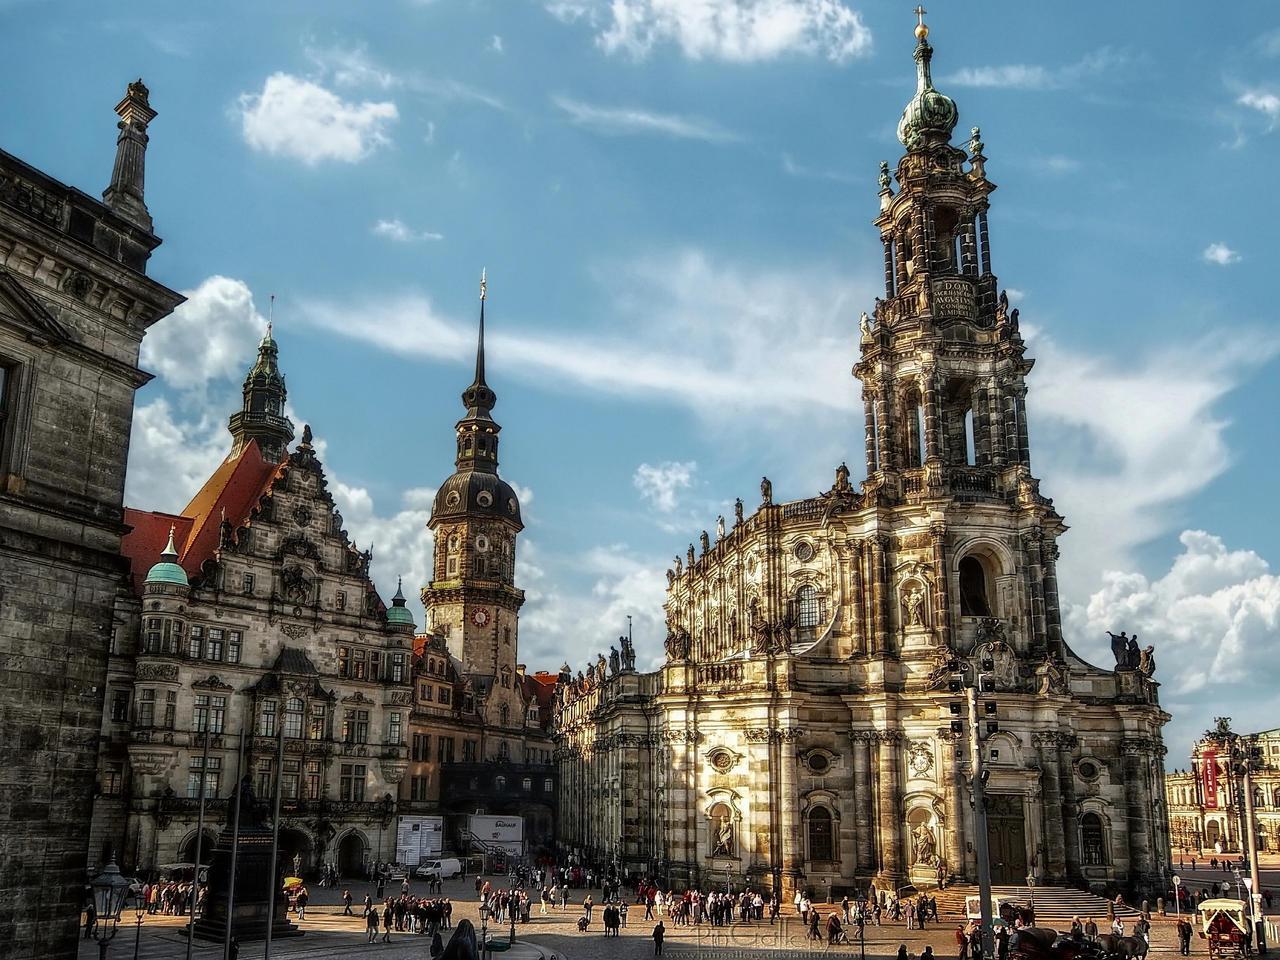 Katholische Hofkirche in Dresden II by pingallery